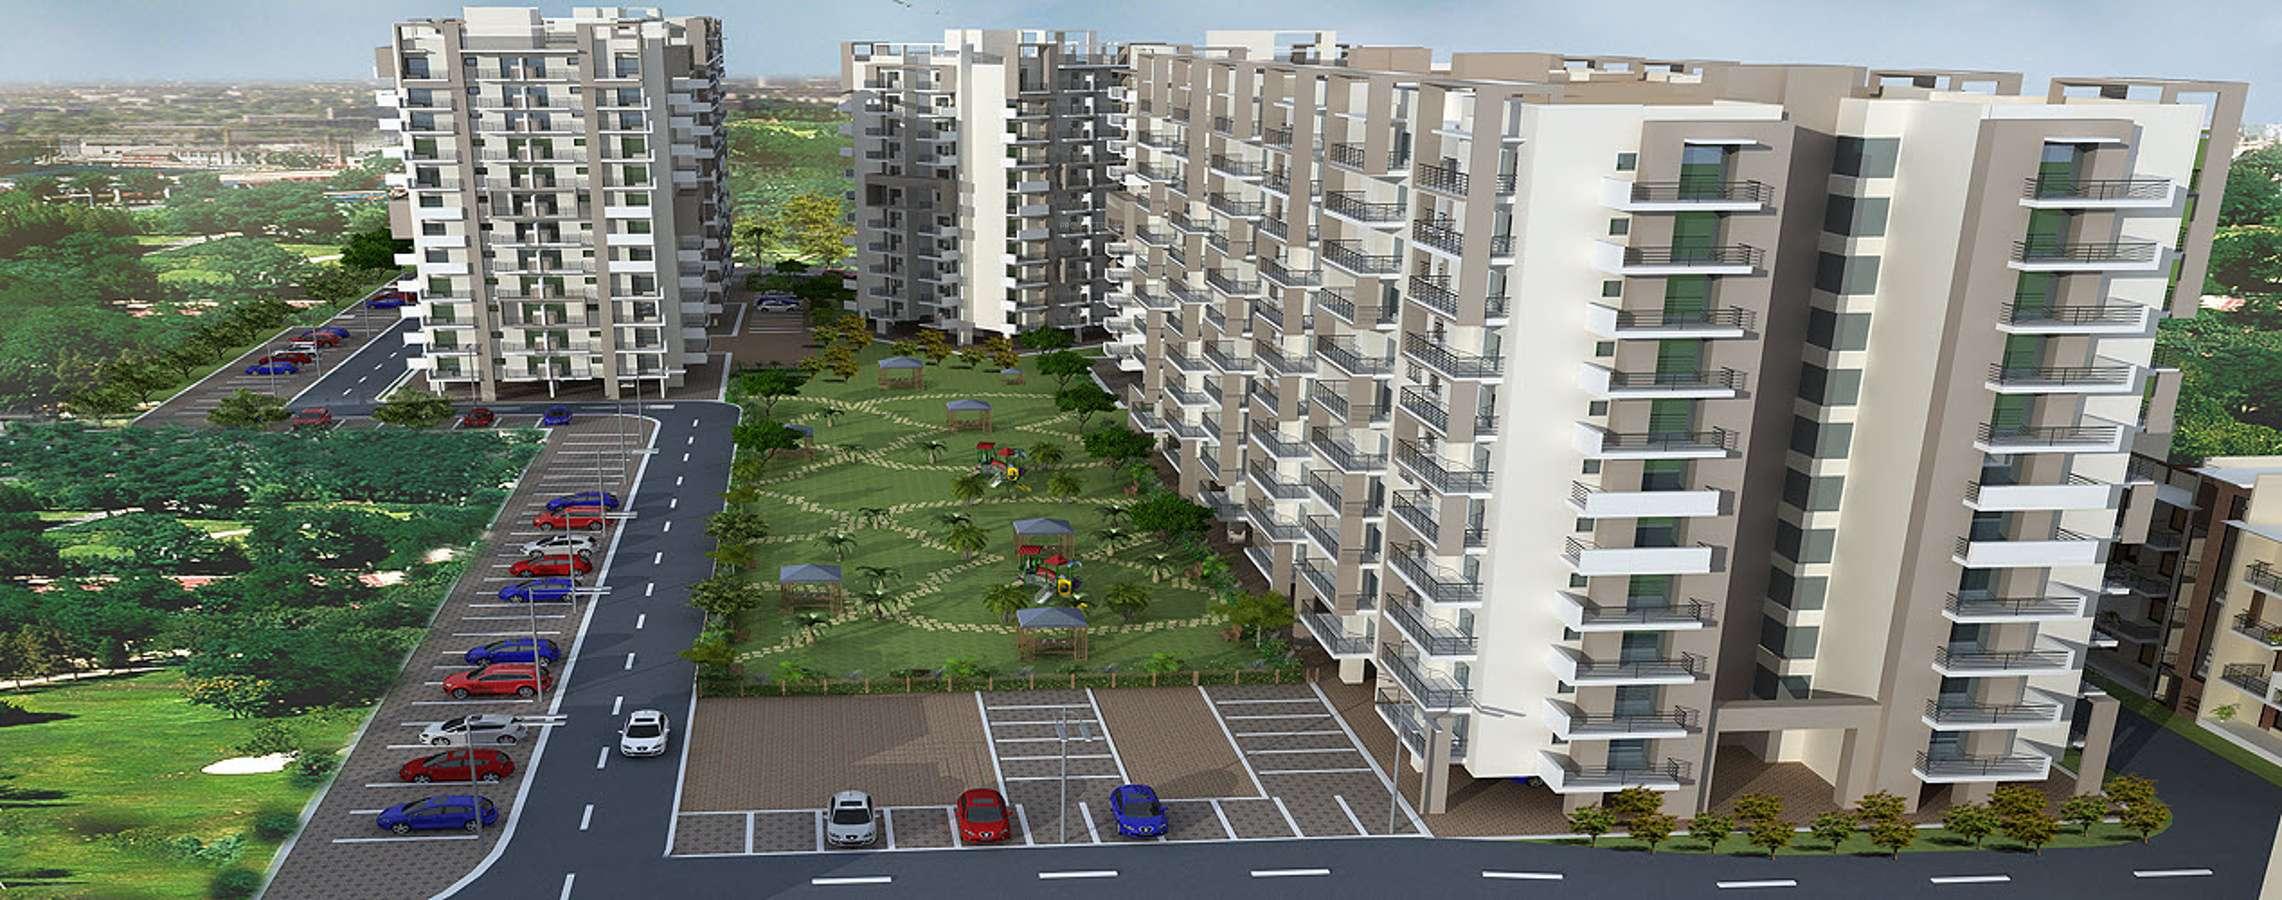 Orchid Greens,Sec-115,Mohali – 2BHK Apartment